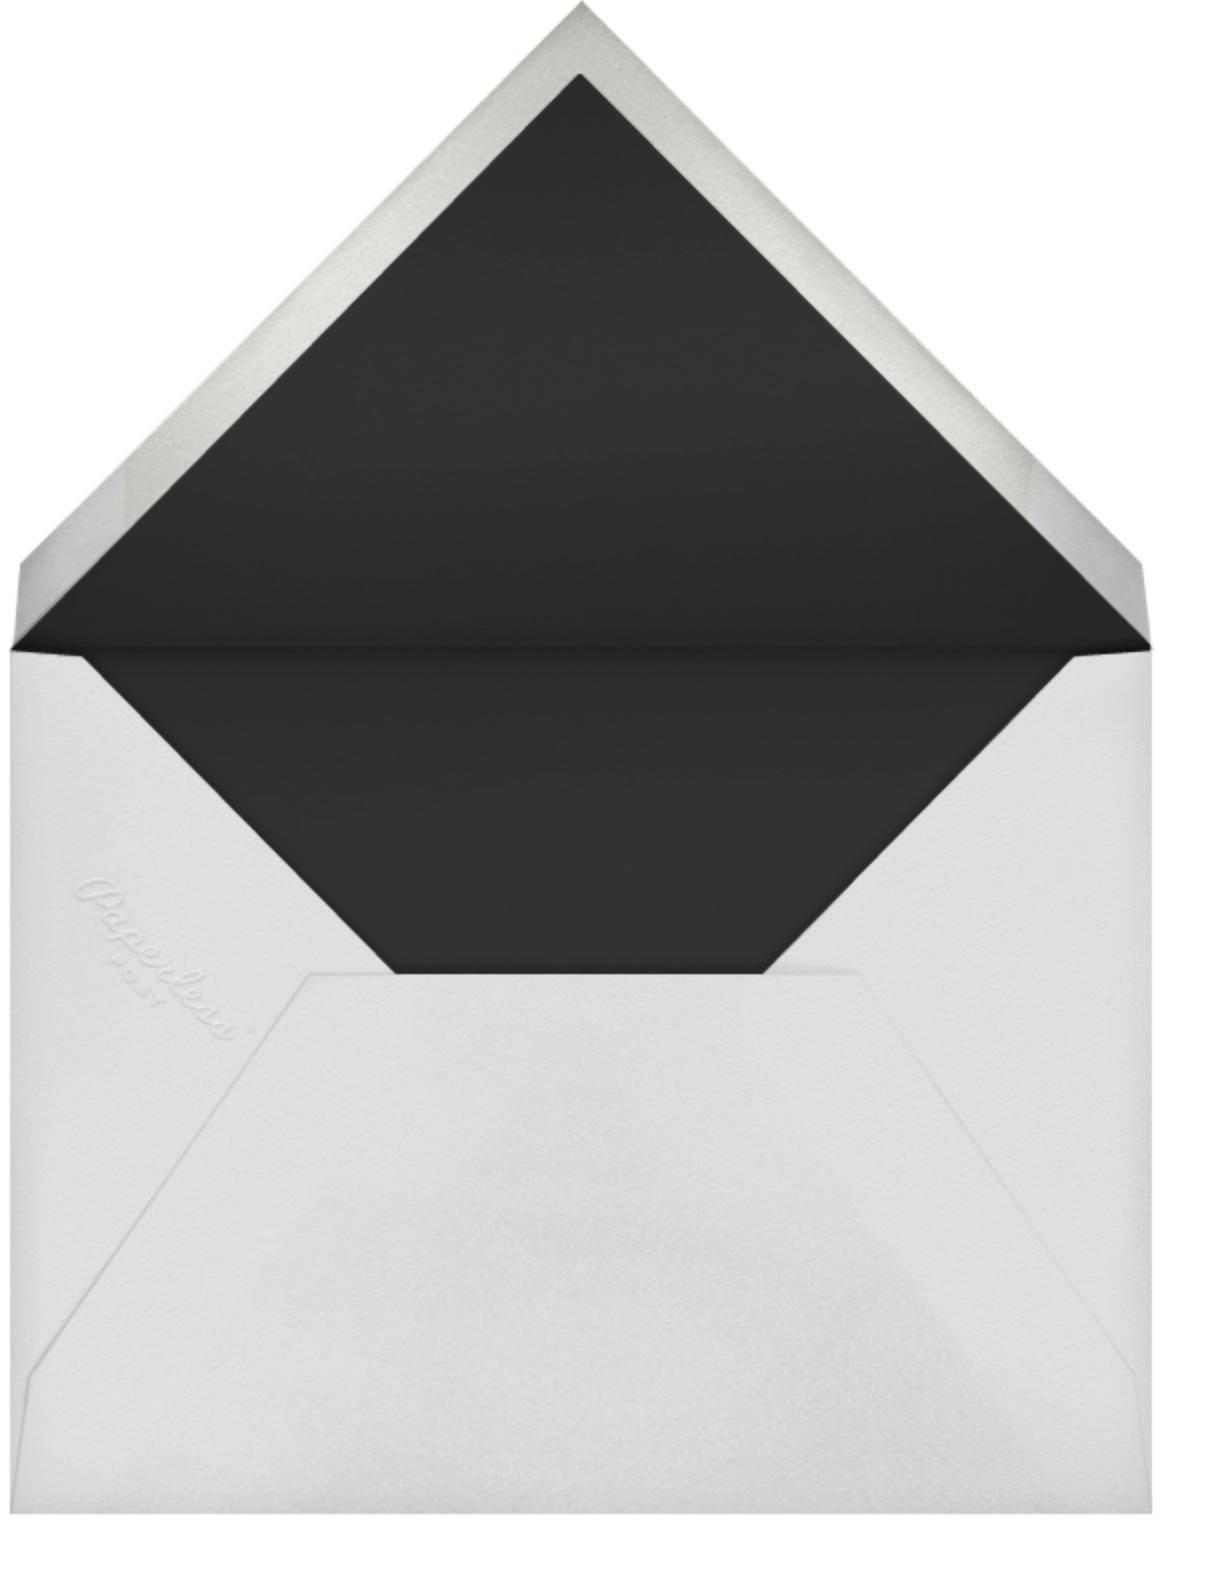 Richmond Park (Photo) - Gold - Oscar de la Renta - Designs we love - envelope back